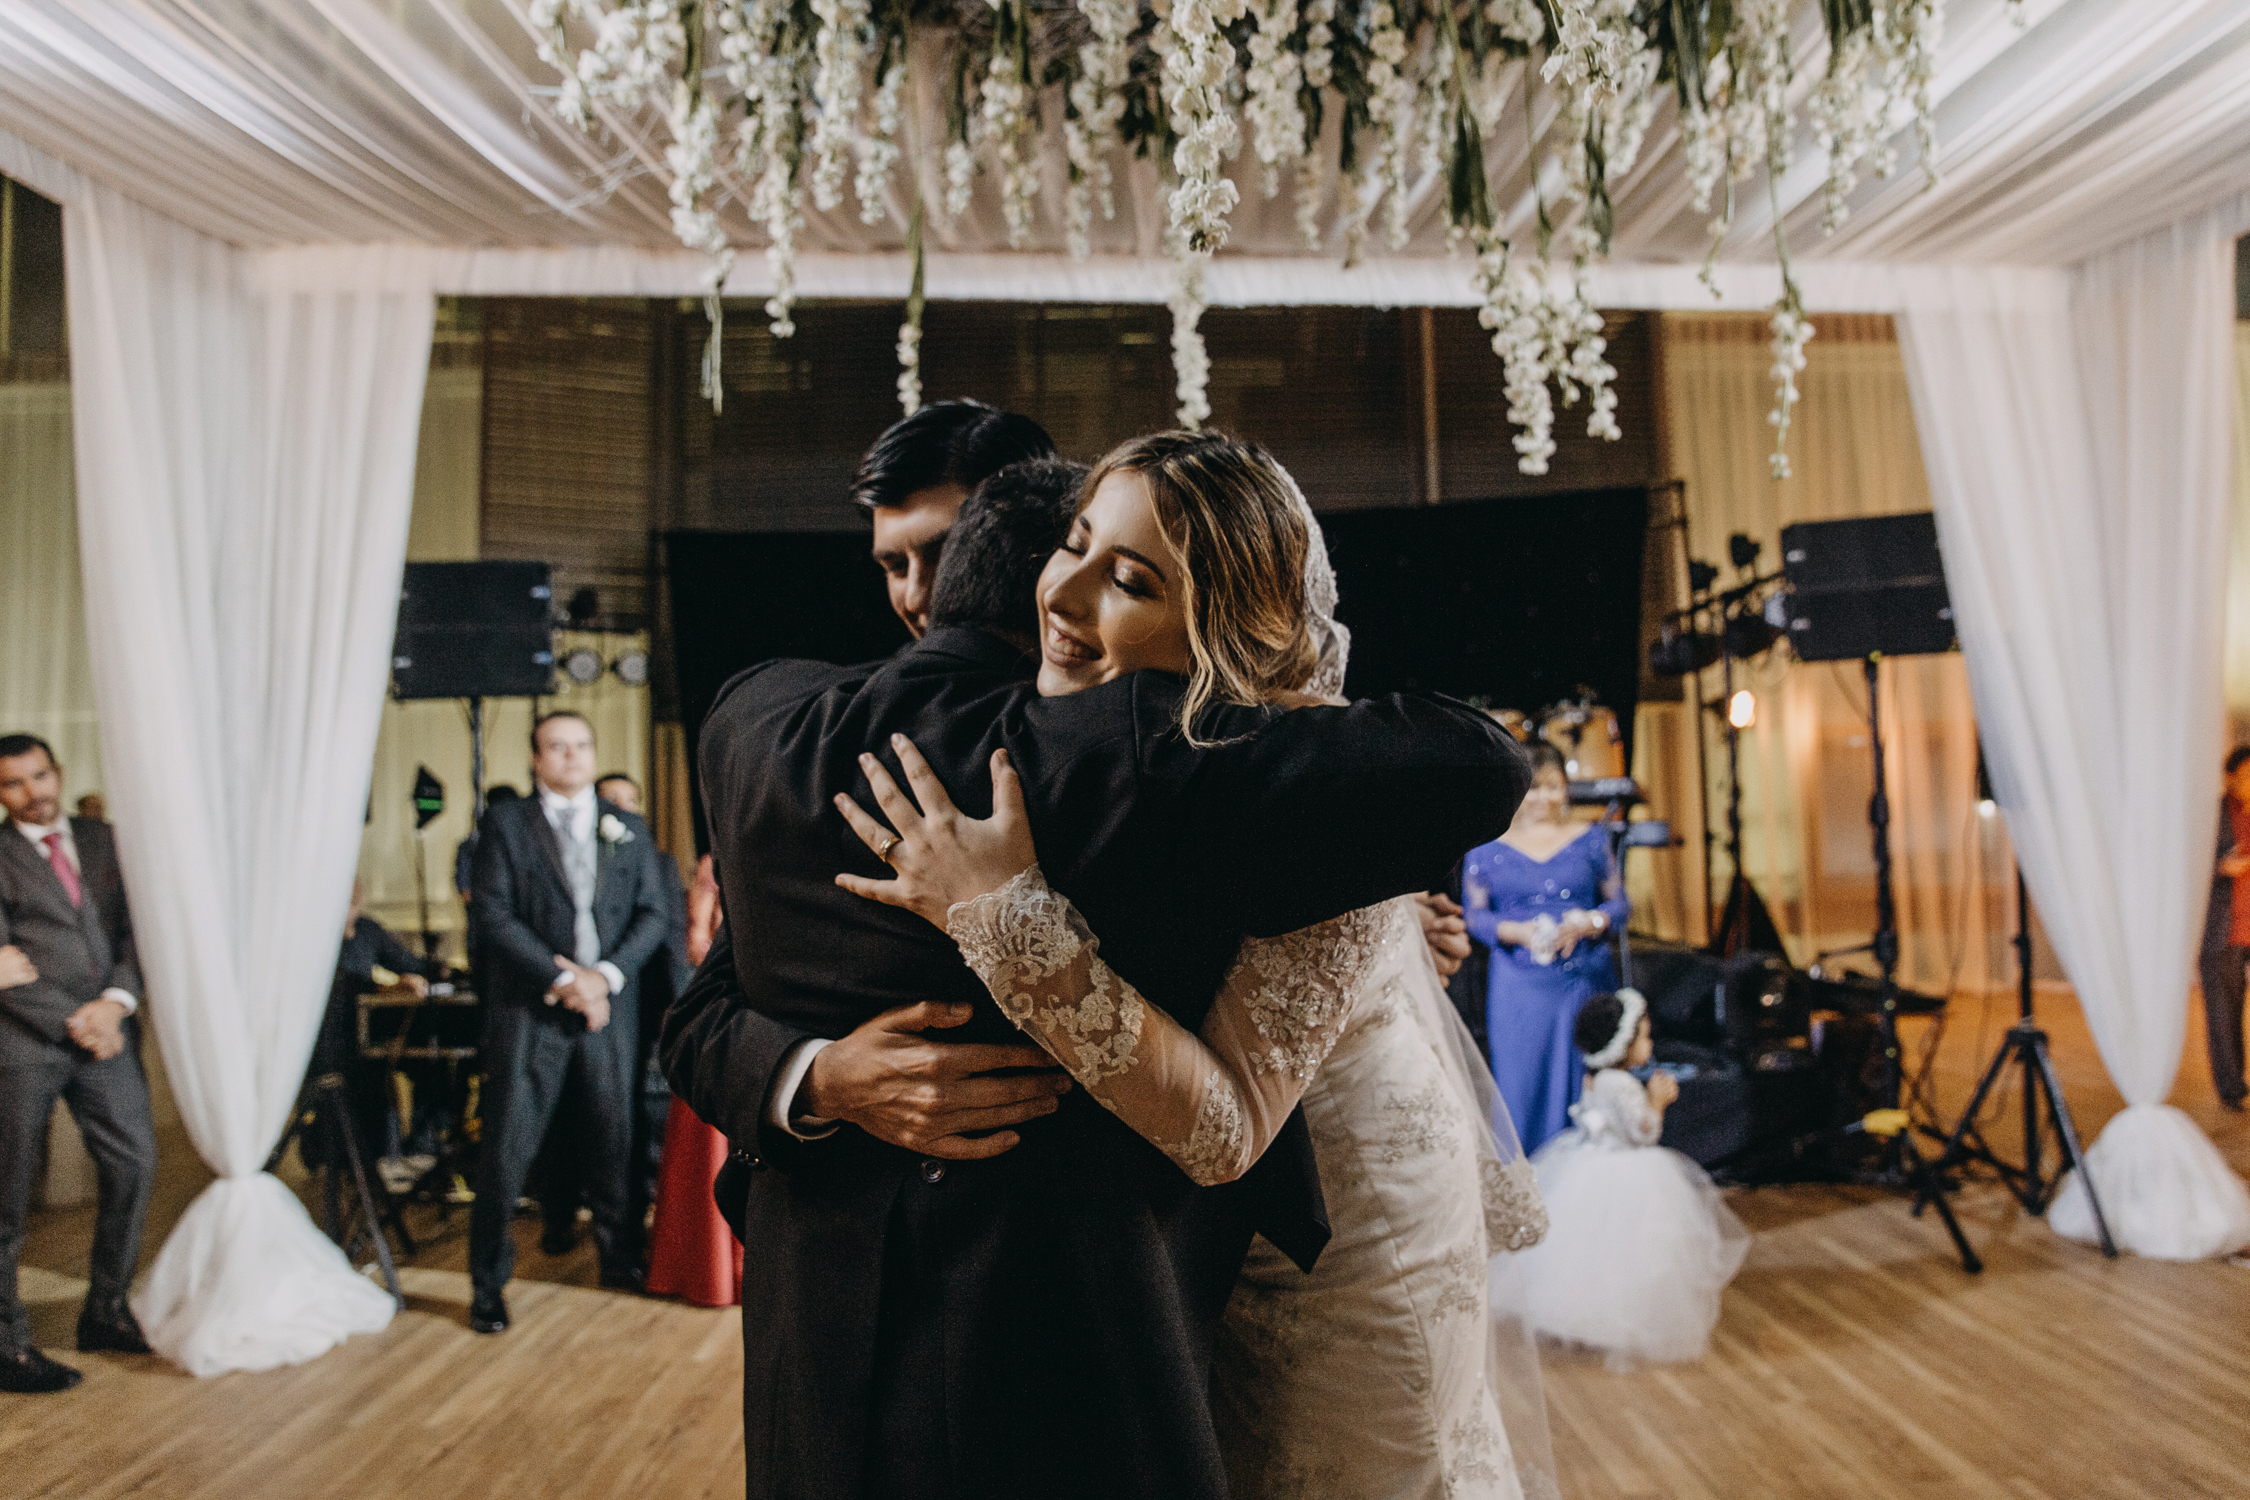 Michelle-Agurto-Fotografia-Bodas-Ecuador-Destination-Wedding-Photographer-Vicky-Javier-143.JPG